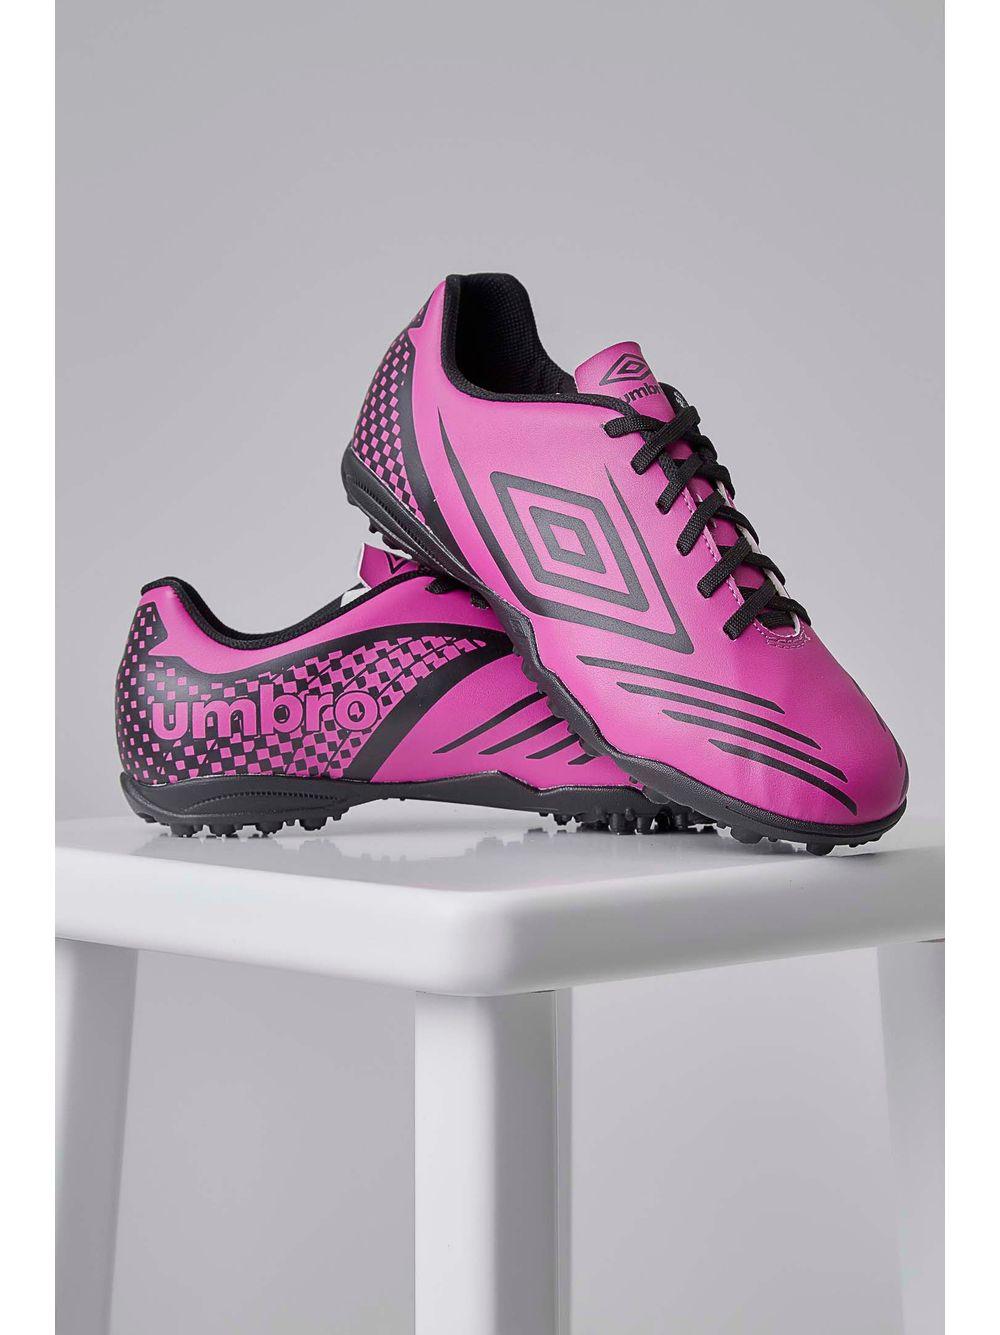 Chuteira Society Umbro Guardian Pink - pittol 6b5d1f8d9ad7f